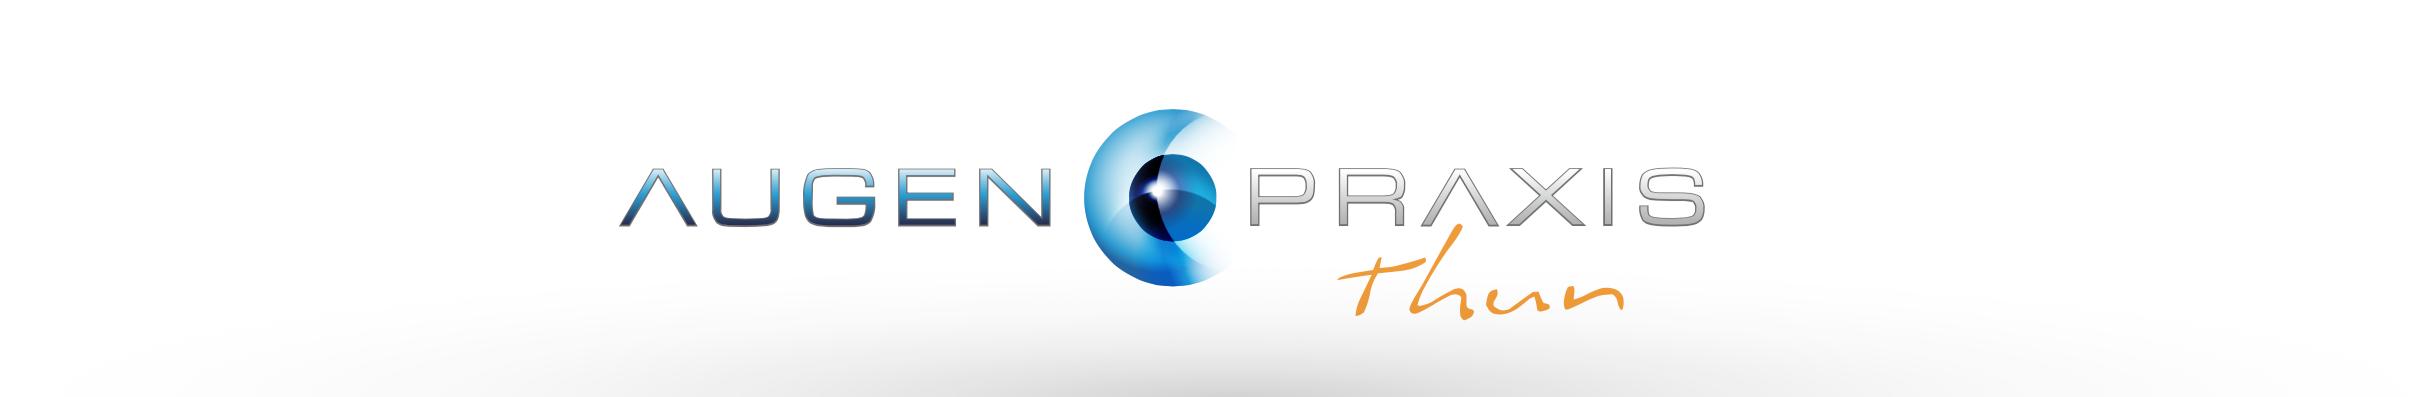 Augenpraxis Thun